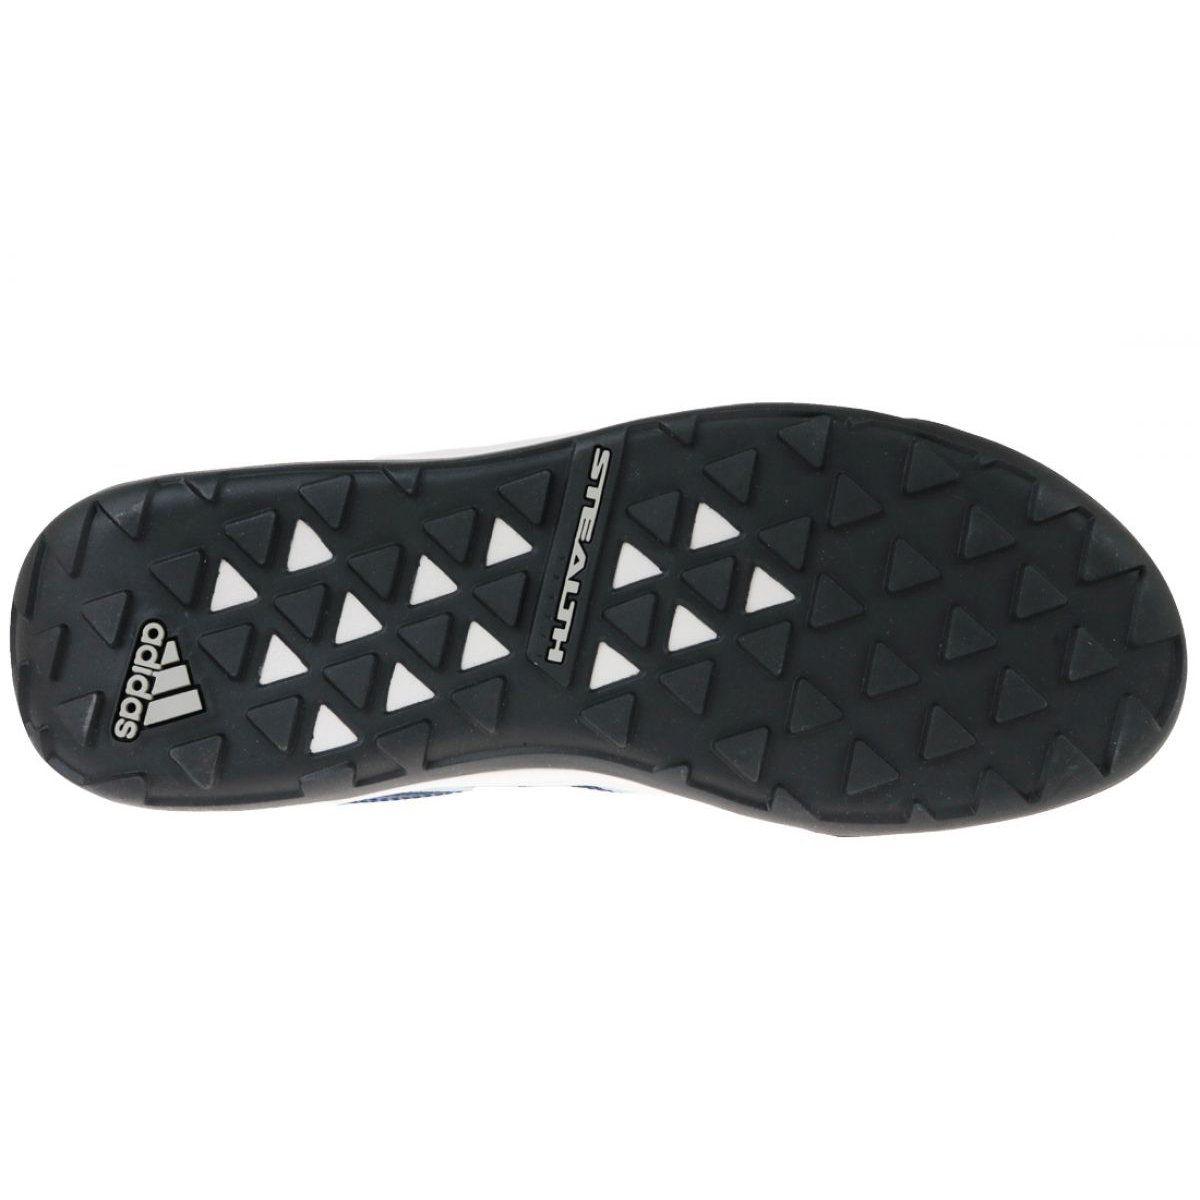 Buty Adidas Terrex Swift Solo M Ac7886 Czarne Niebieskie Black Shoes Sports Shoes Adidas Adidas Brand